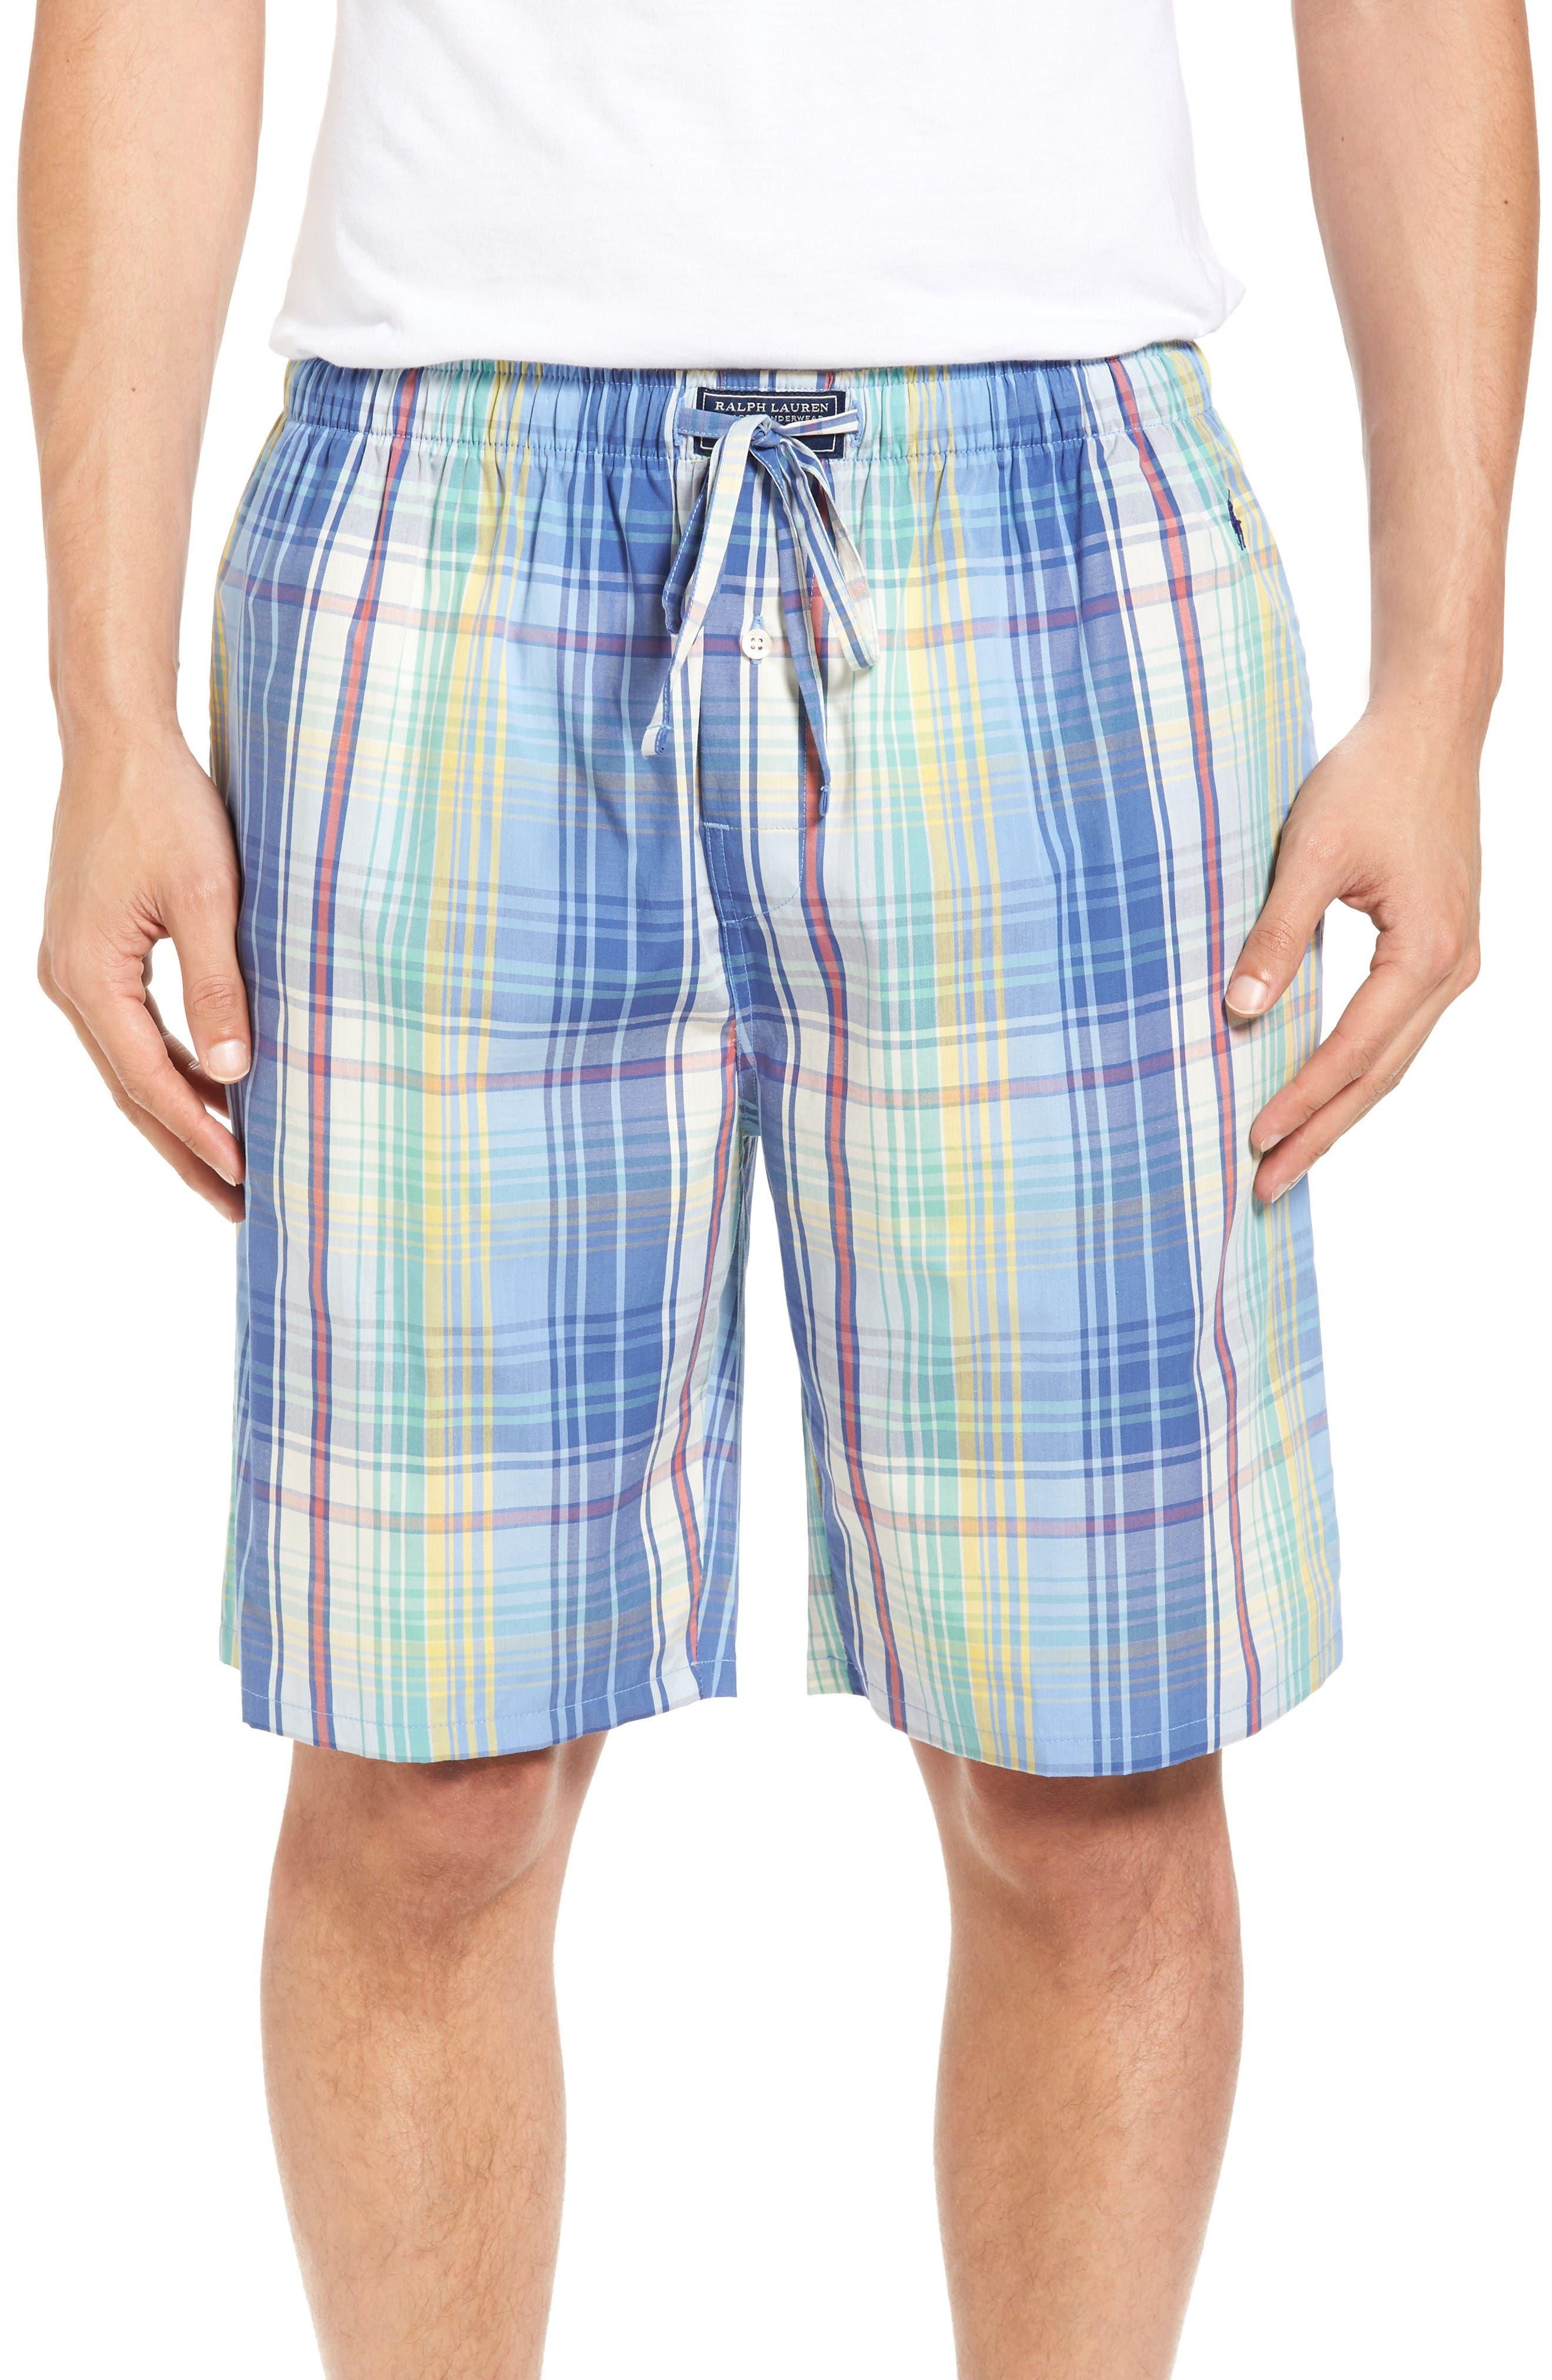 Cotton Pajama Shorts,                         Main,                         color, Avery Plaid